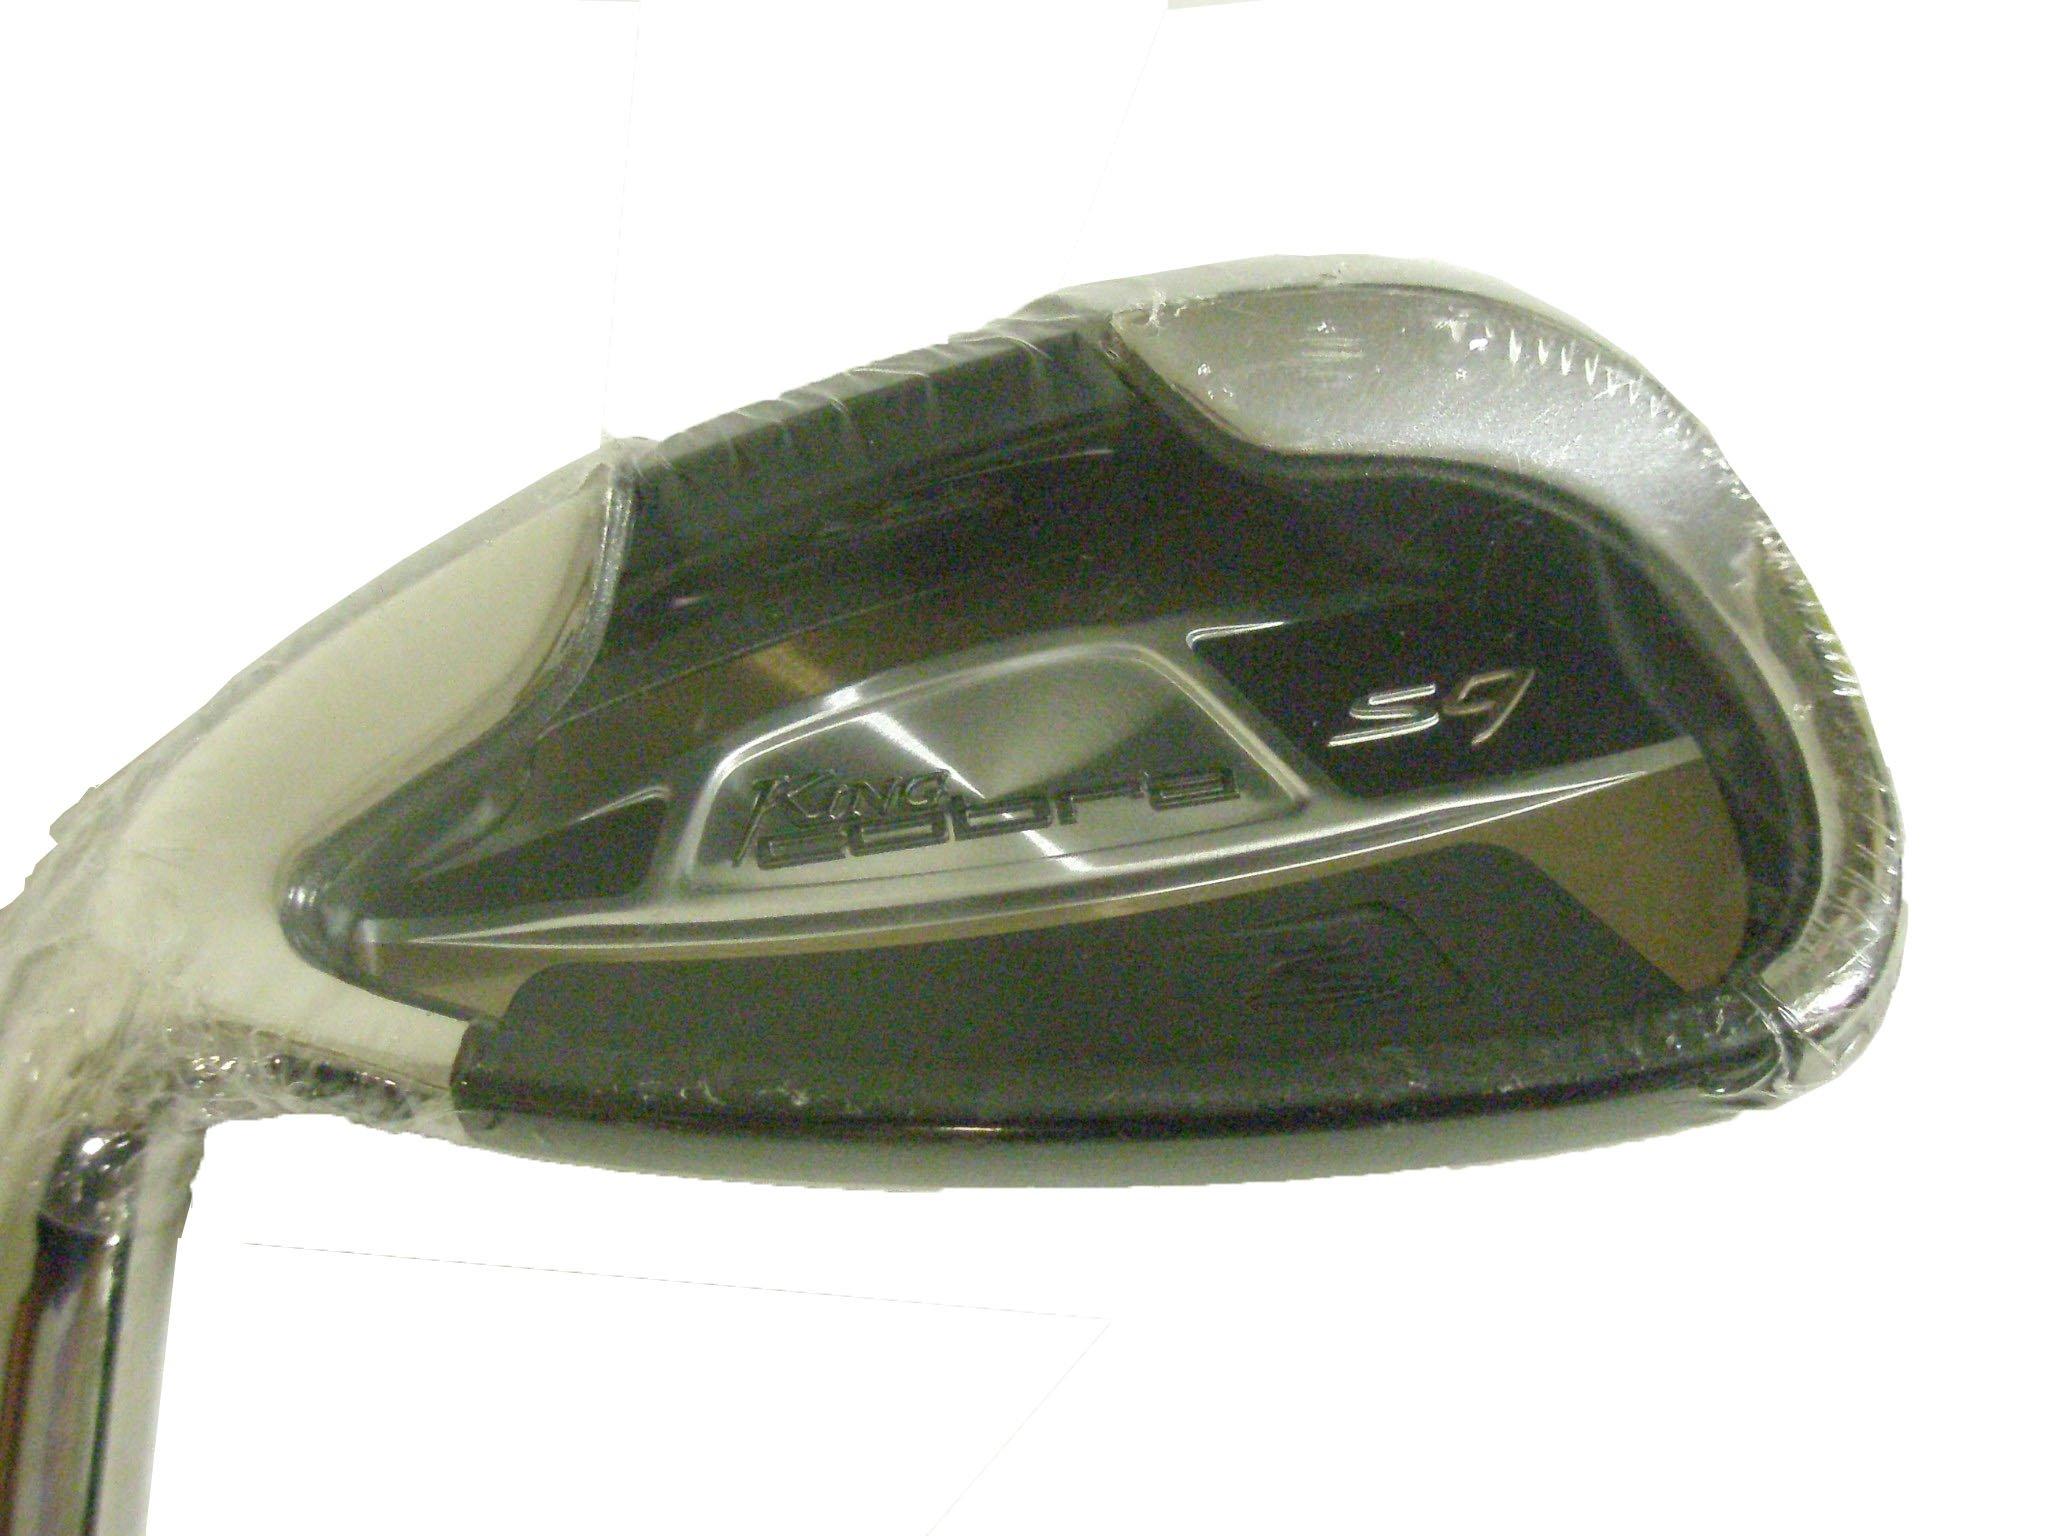 King Cobra S9 Senior 6 iron (Steel NS Pro 1030 H, Stiff LEFT) 6i Golf Club